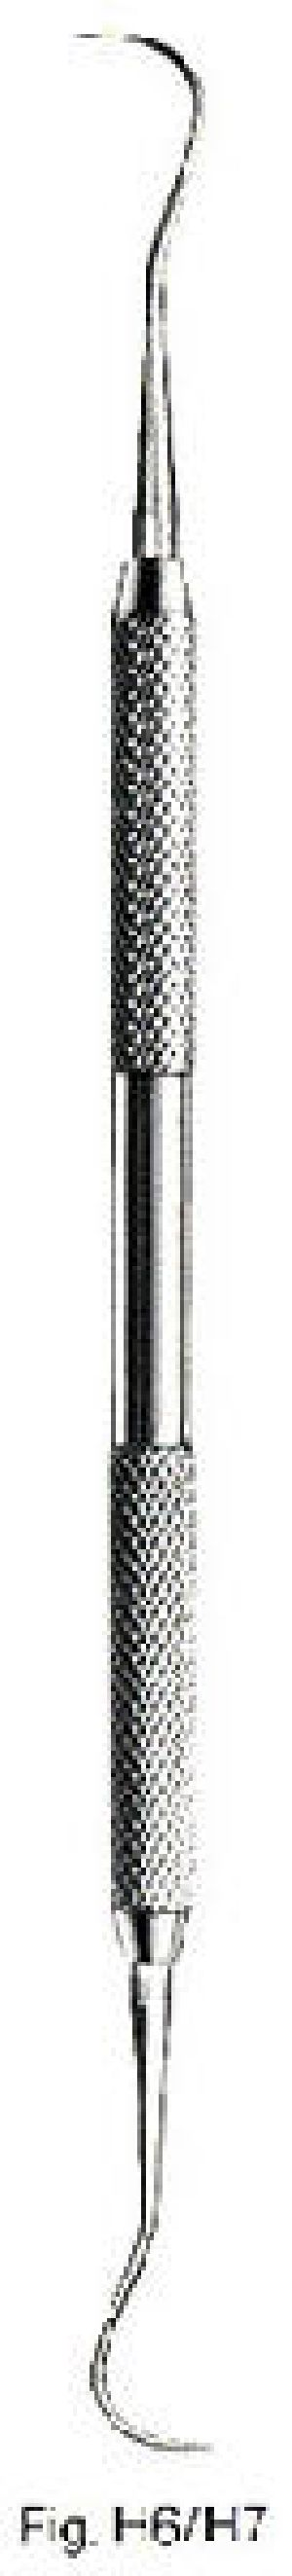 MI-72-108 Dental Scaler